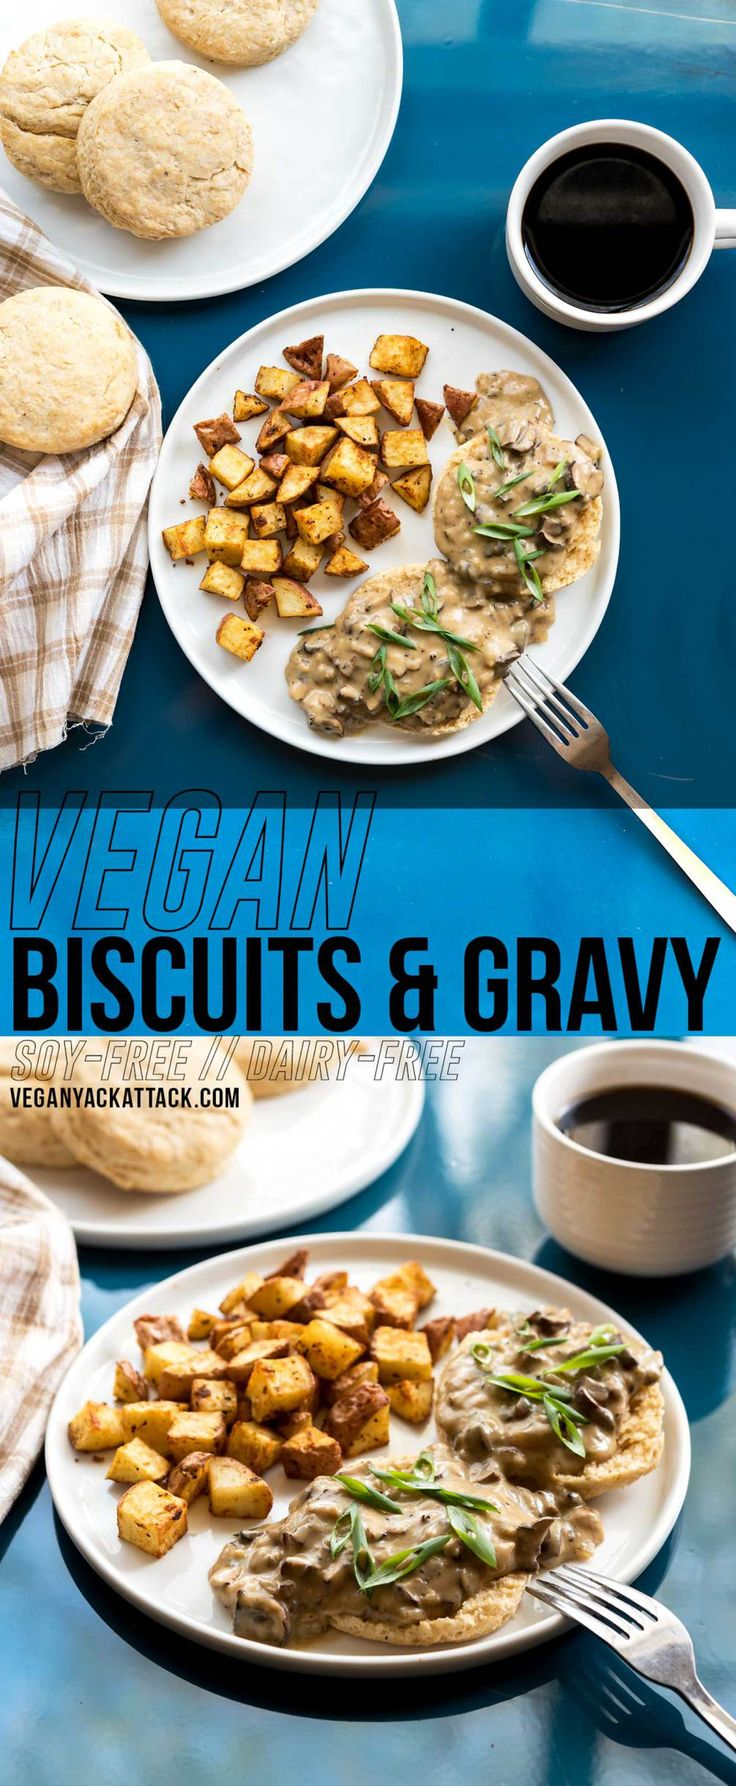 15 best Vegan for Everybody images on Pinterest | Americas test ...